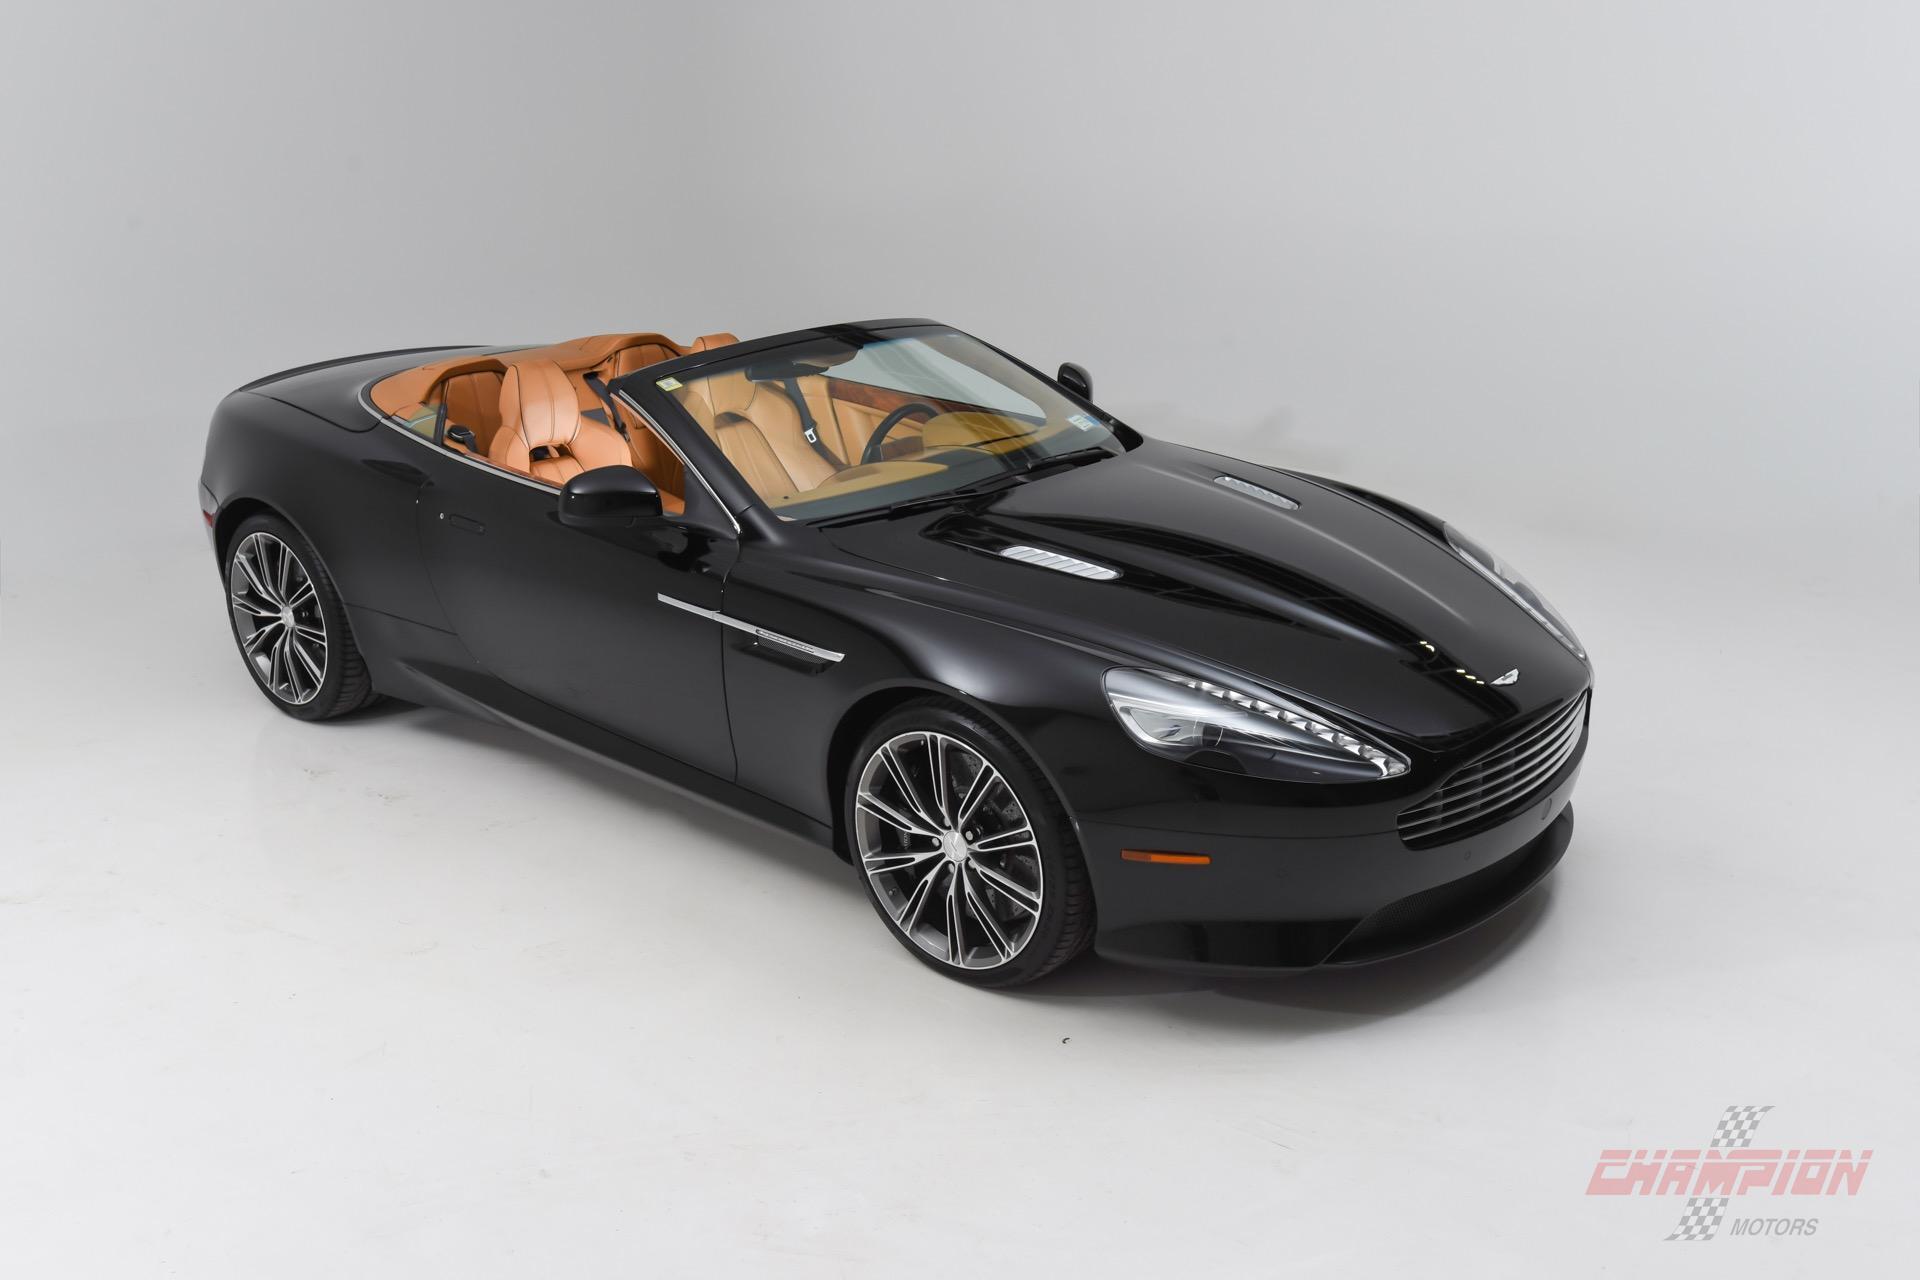 2012 Aston Martin DB9 Virage Volante Champion Motors International L Luxury Classic Vehicle